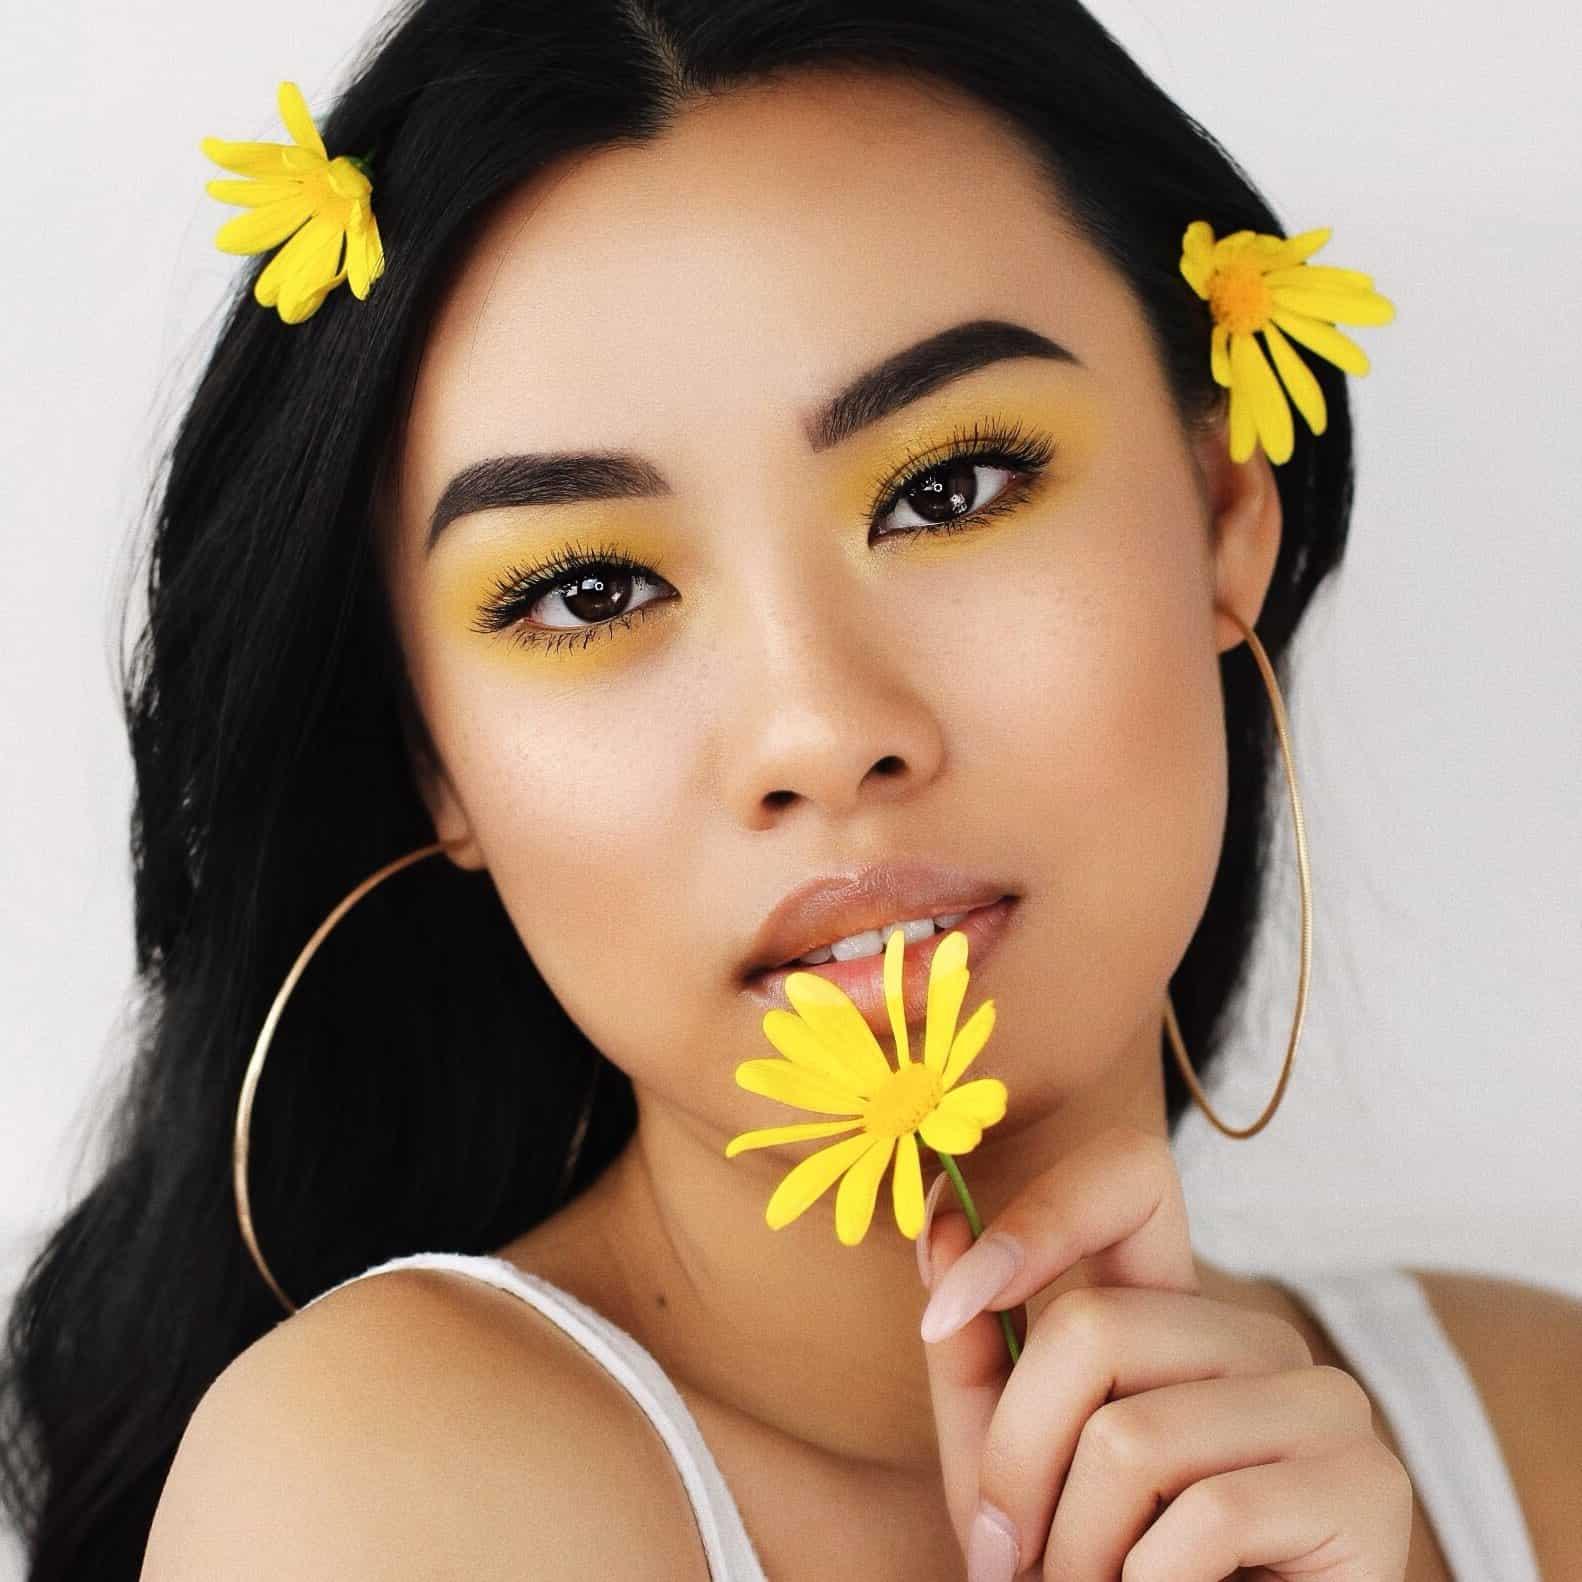 beauty blogger Joanna Vongphoumy